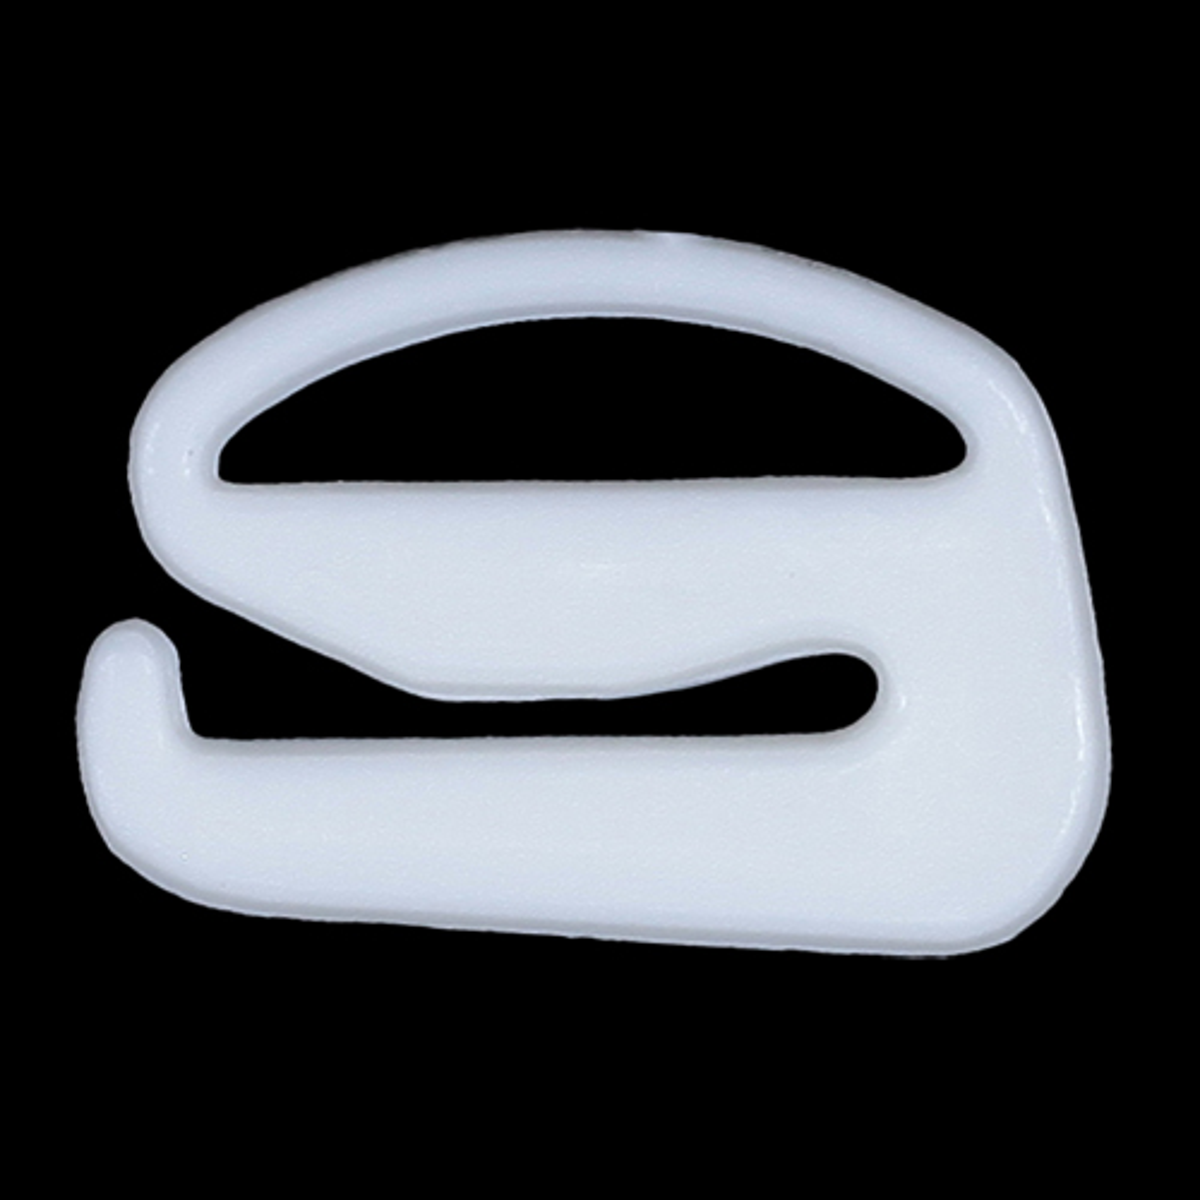 ГС1009 Крючок 12мм пластик, белый